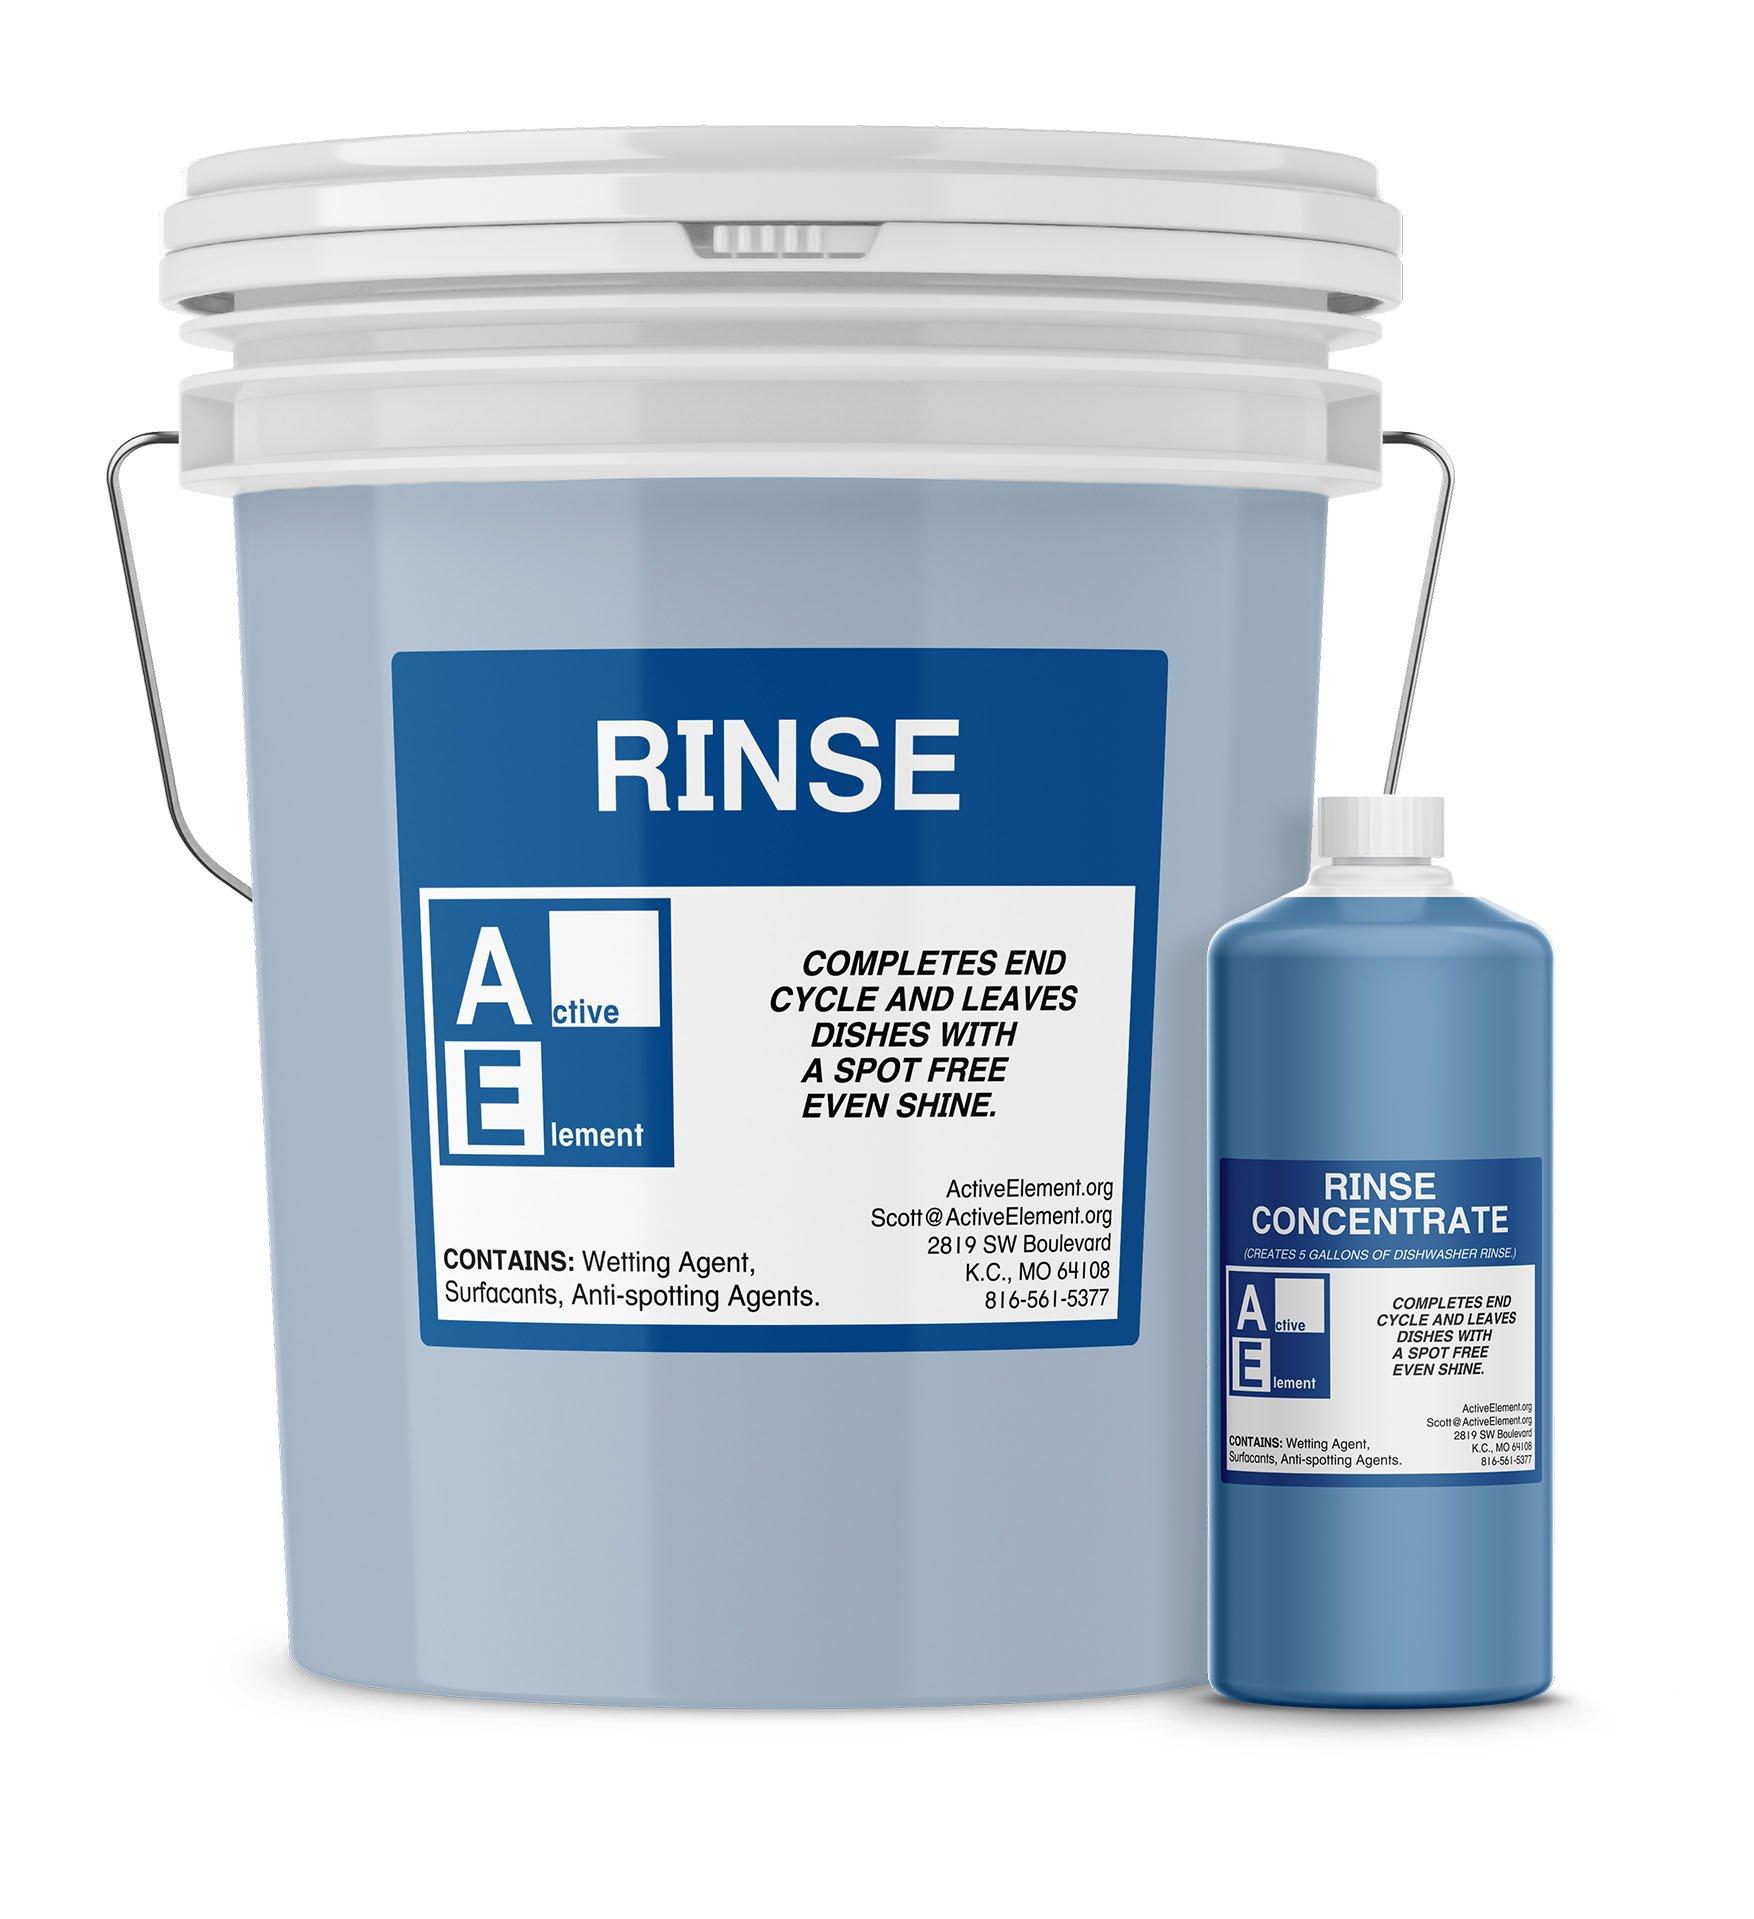 Commercial Dishwasher Rinse, Makes twelve 5-gallon pails, (12/case) by Active Element